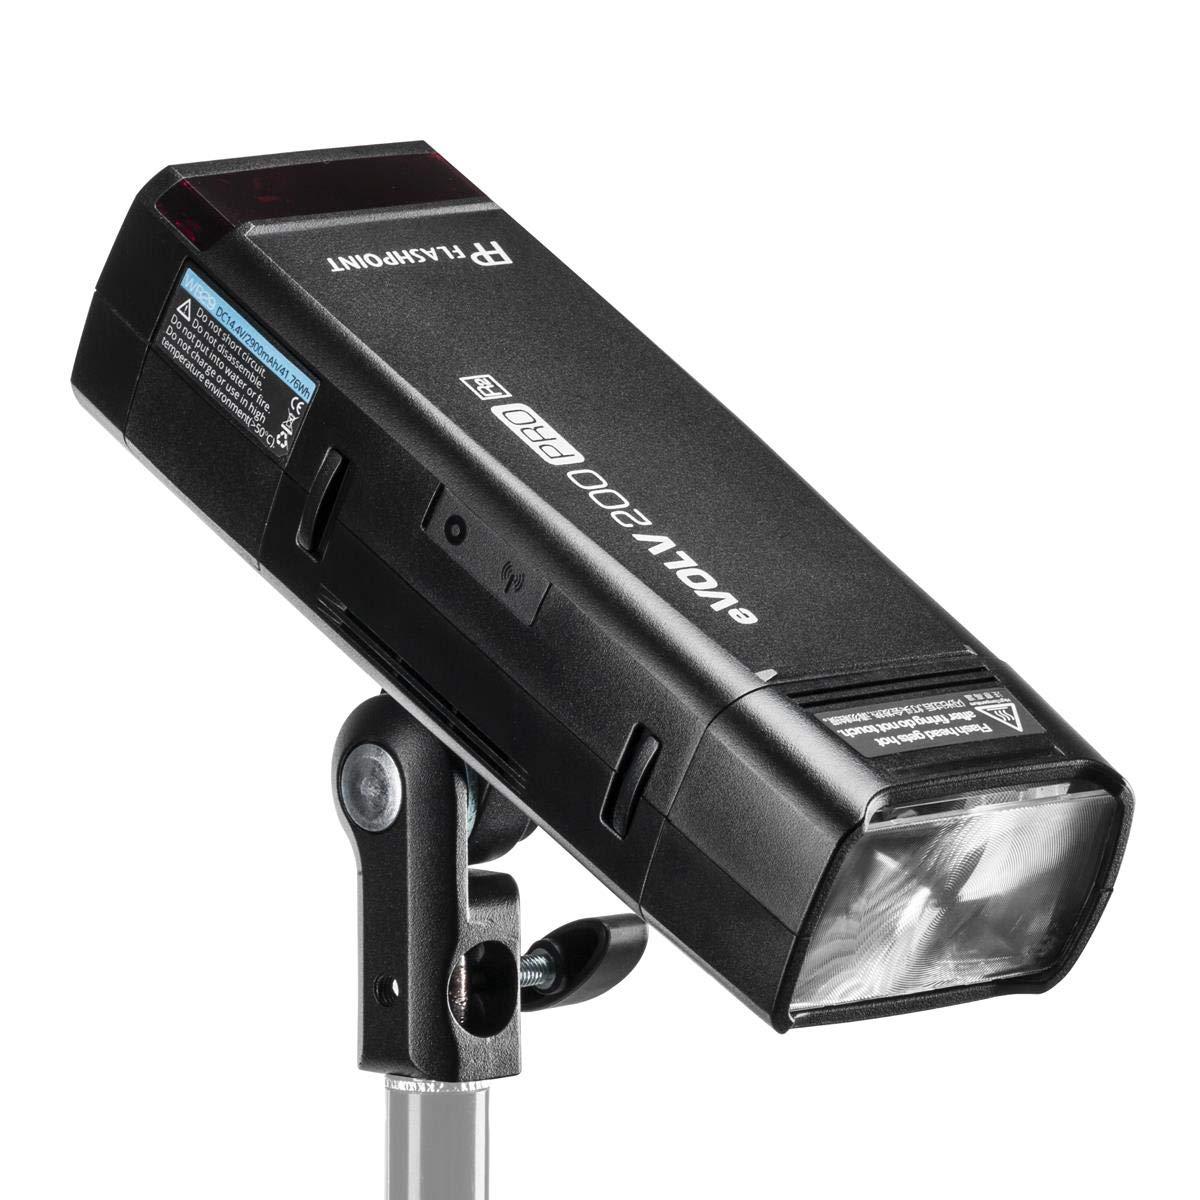 Flashpoint eVOLV 200 Pro TTL Pocket Flash with Barndoor Kit